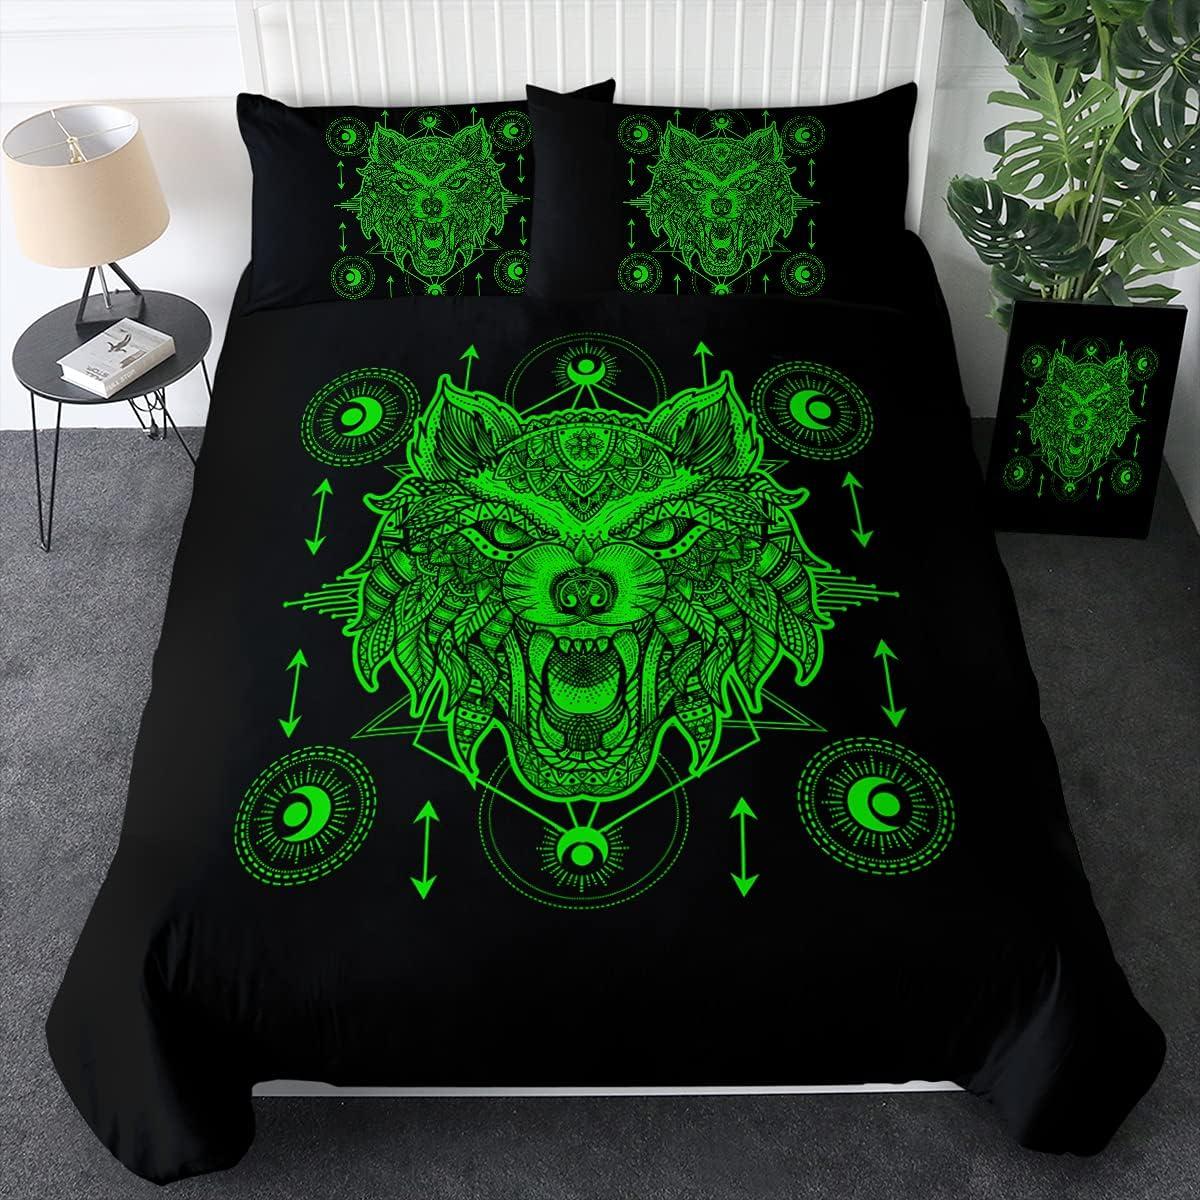 Sleepwish Wolf Bedding Green Max 56% OFF Mandala Full Sets Duvet Cover Popular standard Size